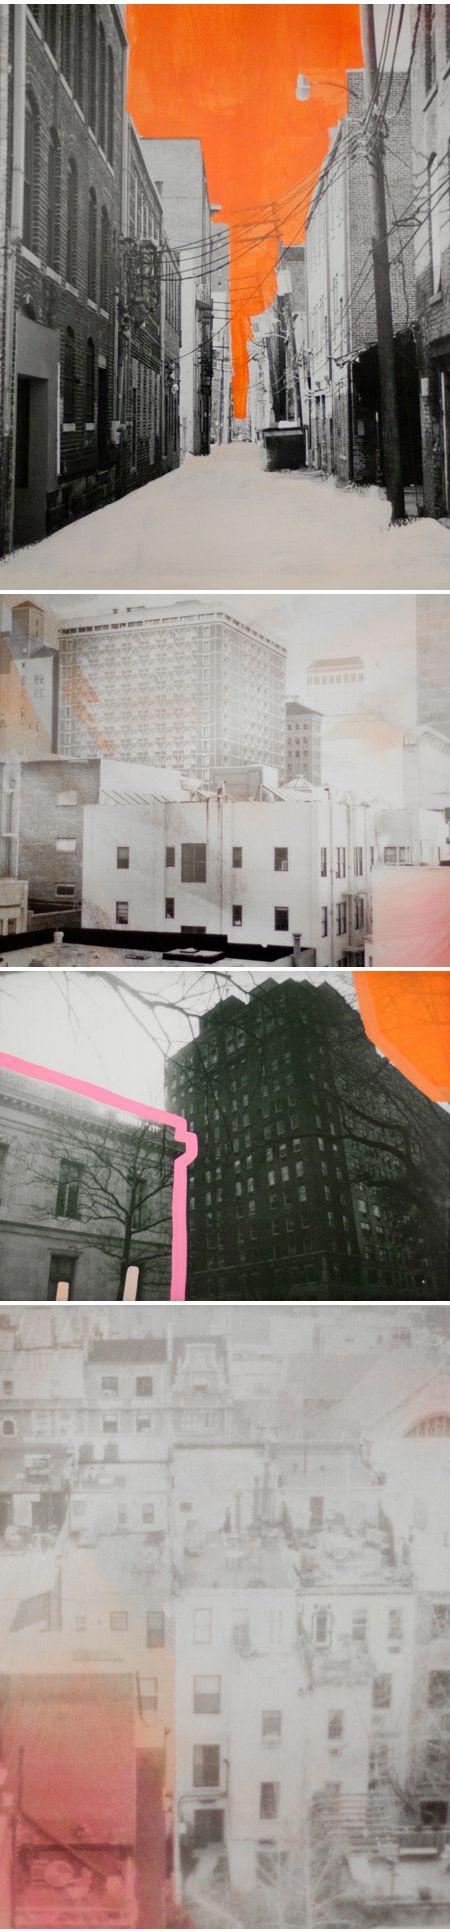 #britt bass & #morgan blake collaboration #cityscape #orange #art #abstract #pop #surrealism #bakehouseboards